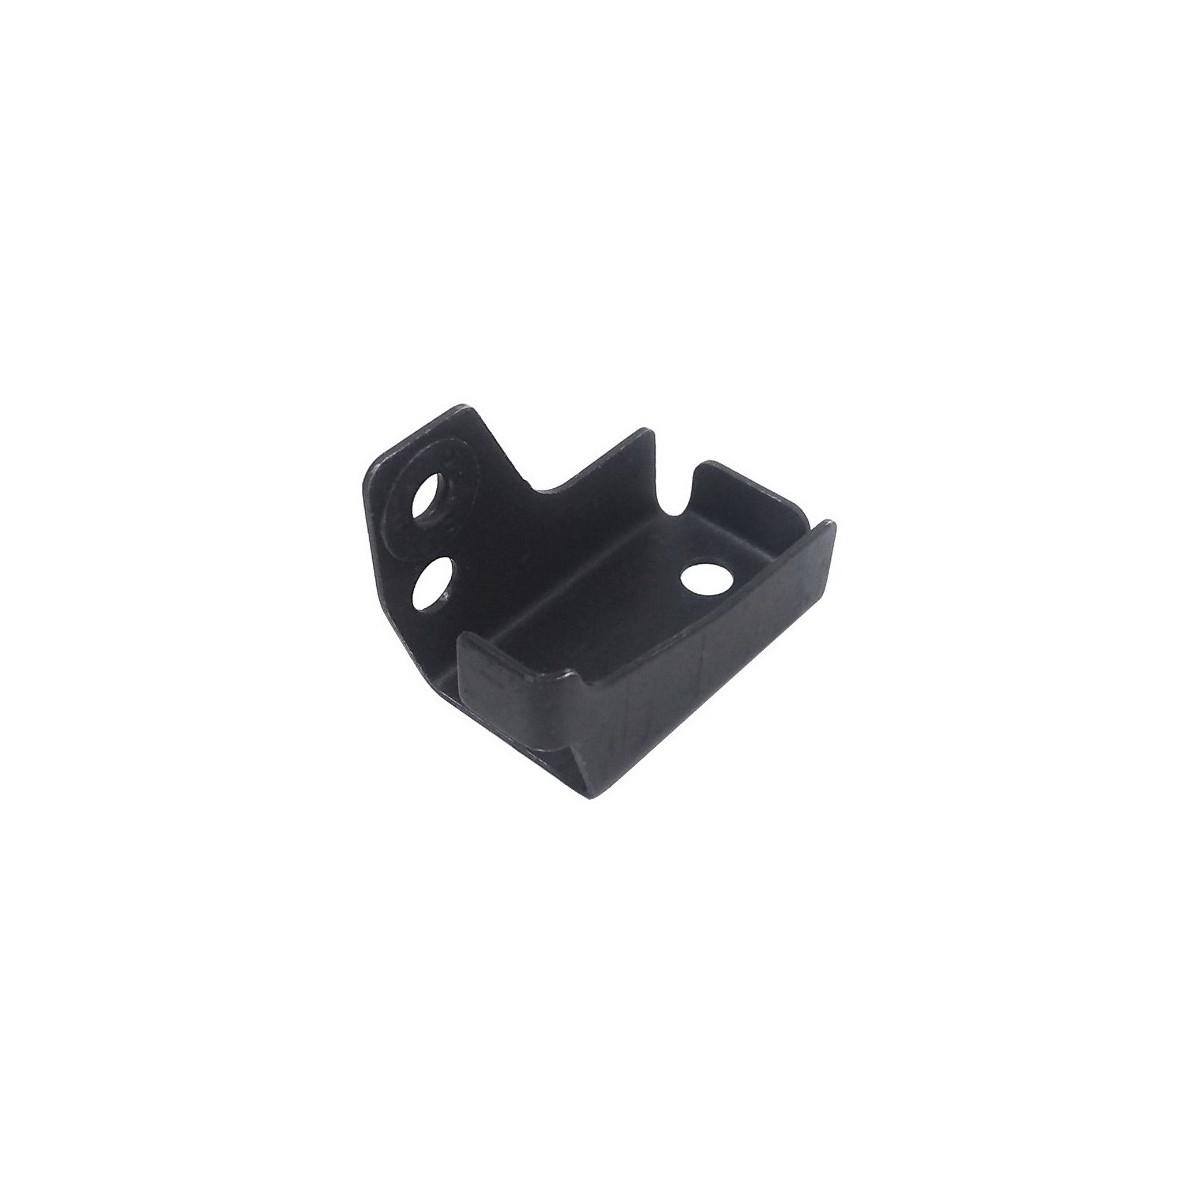 Cubre Switch de Muleta Bajaj Dominar 400 Original